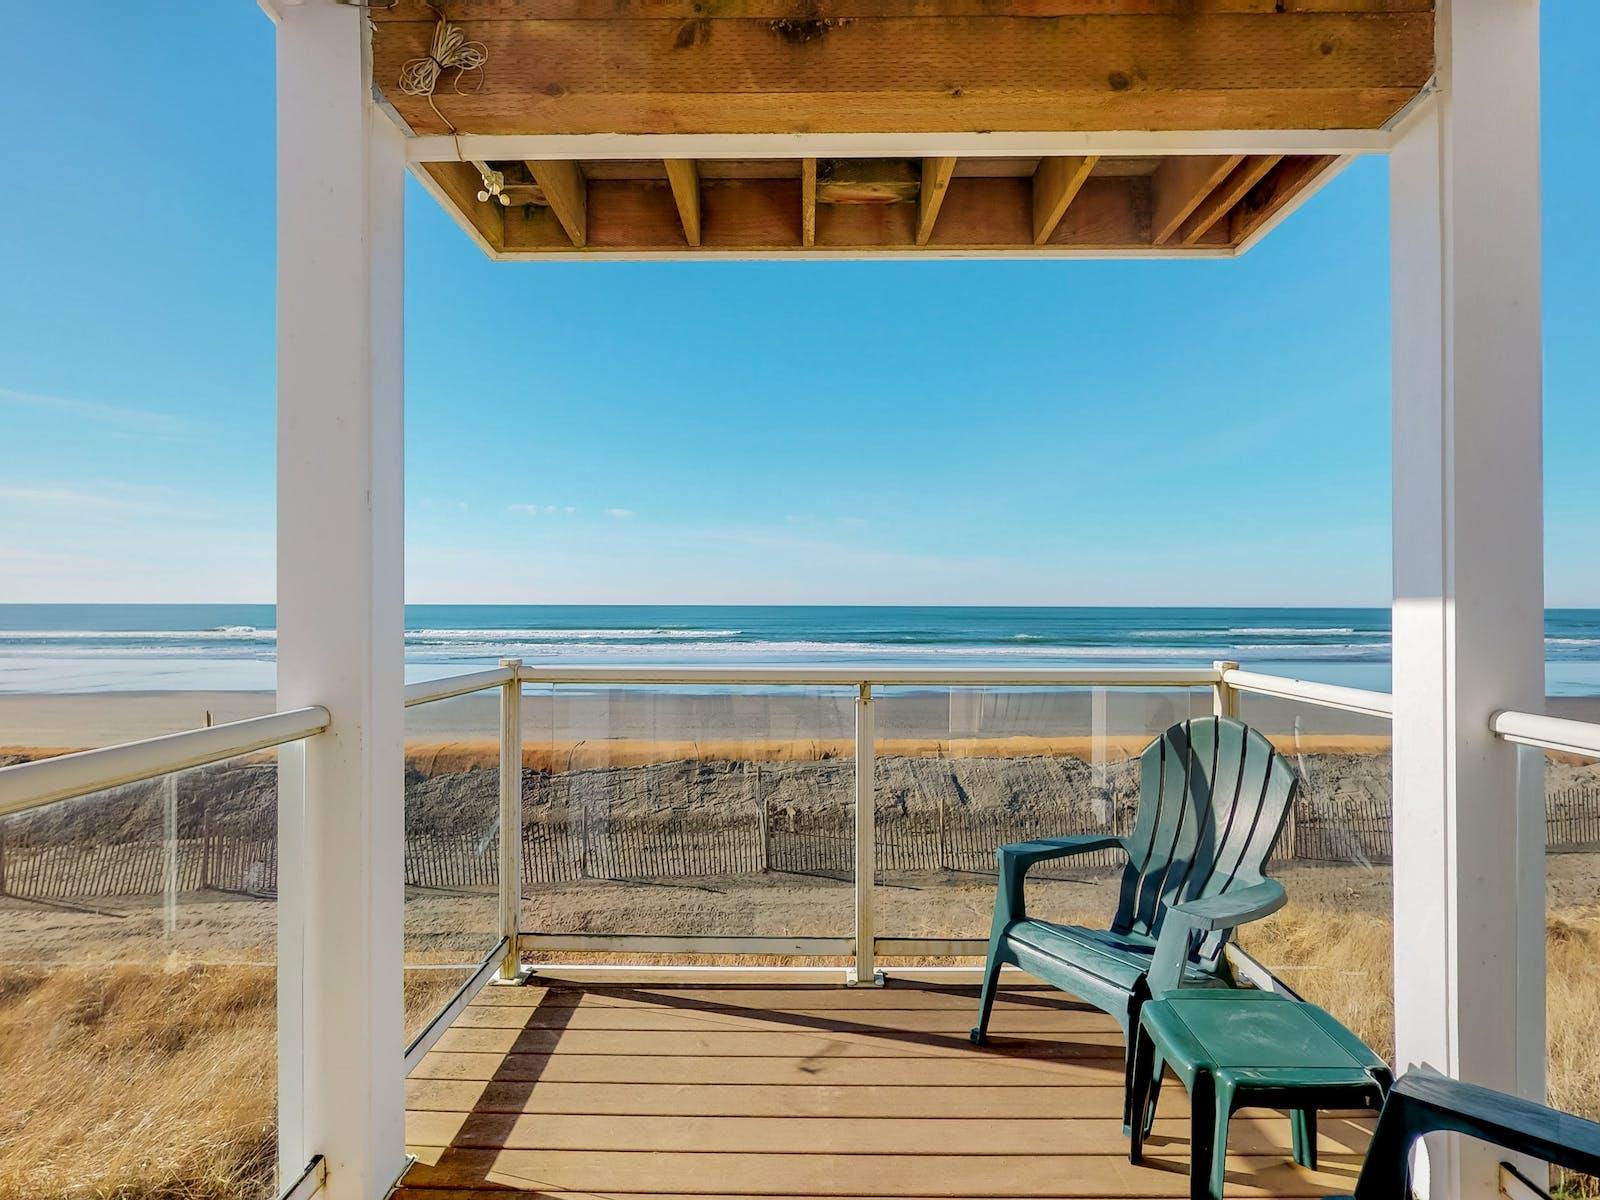 view of beach from Ocean Shores, WA beach house